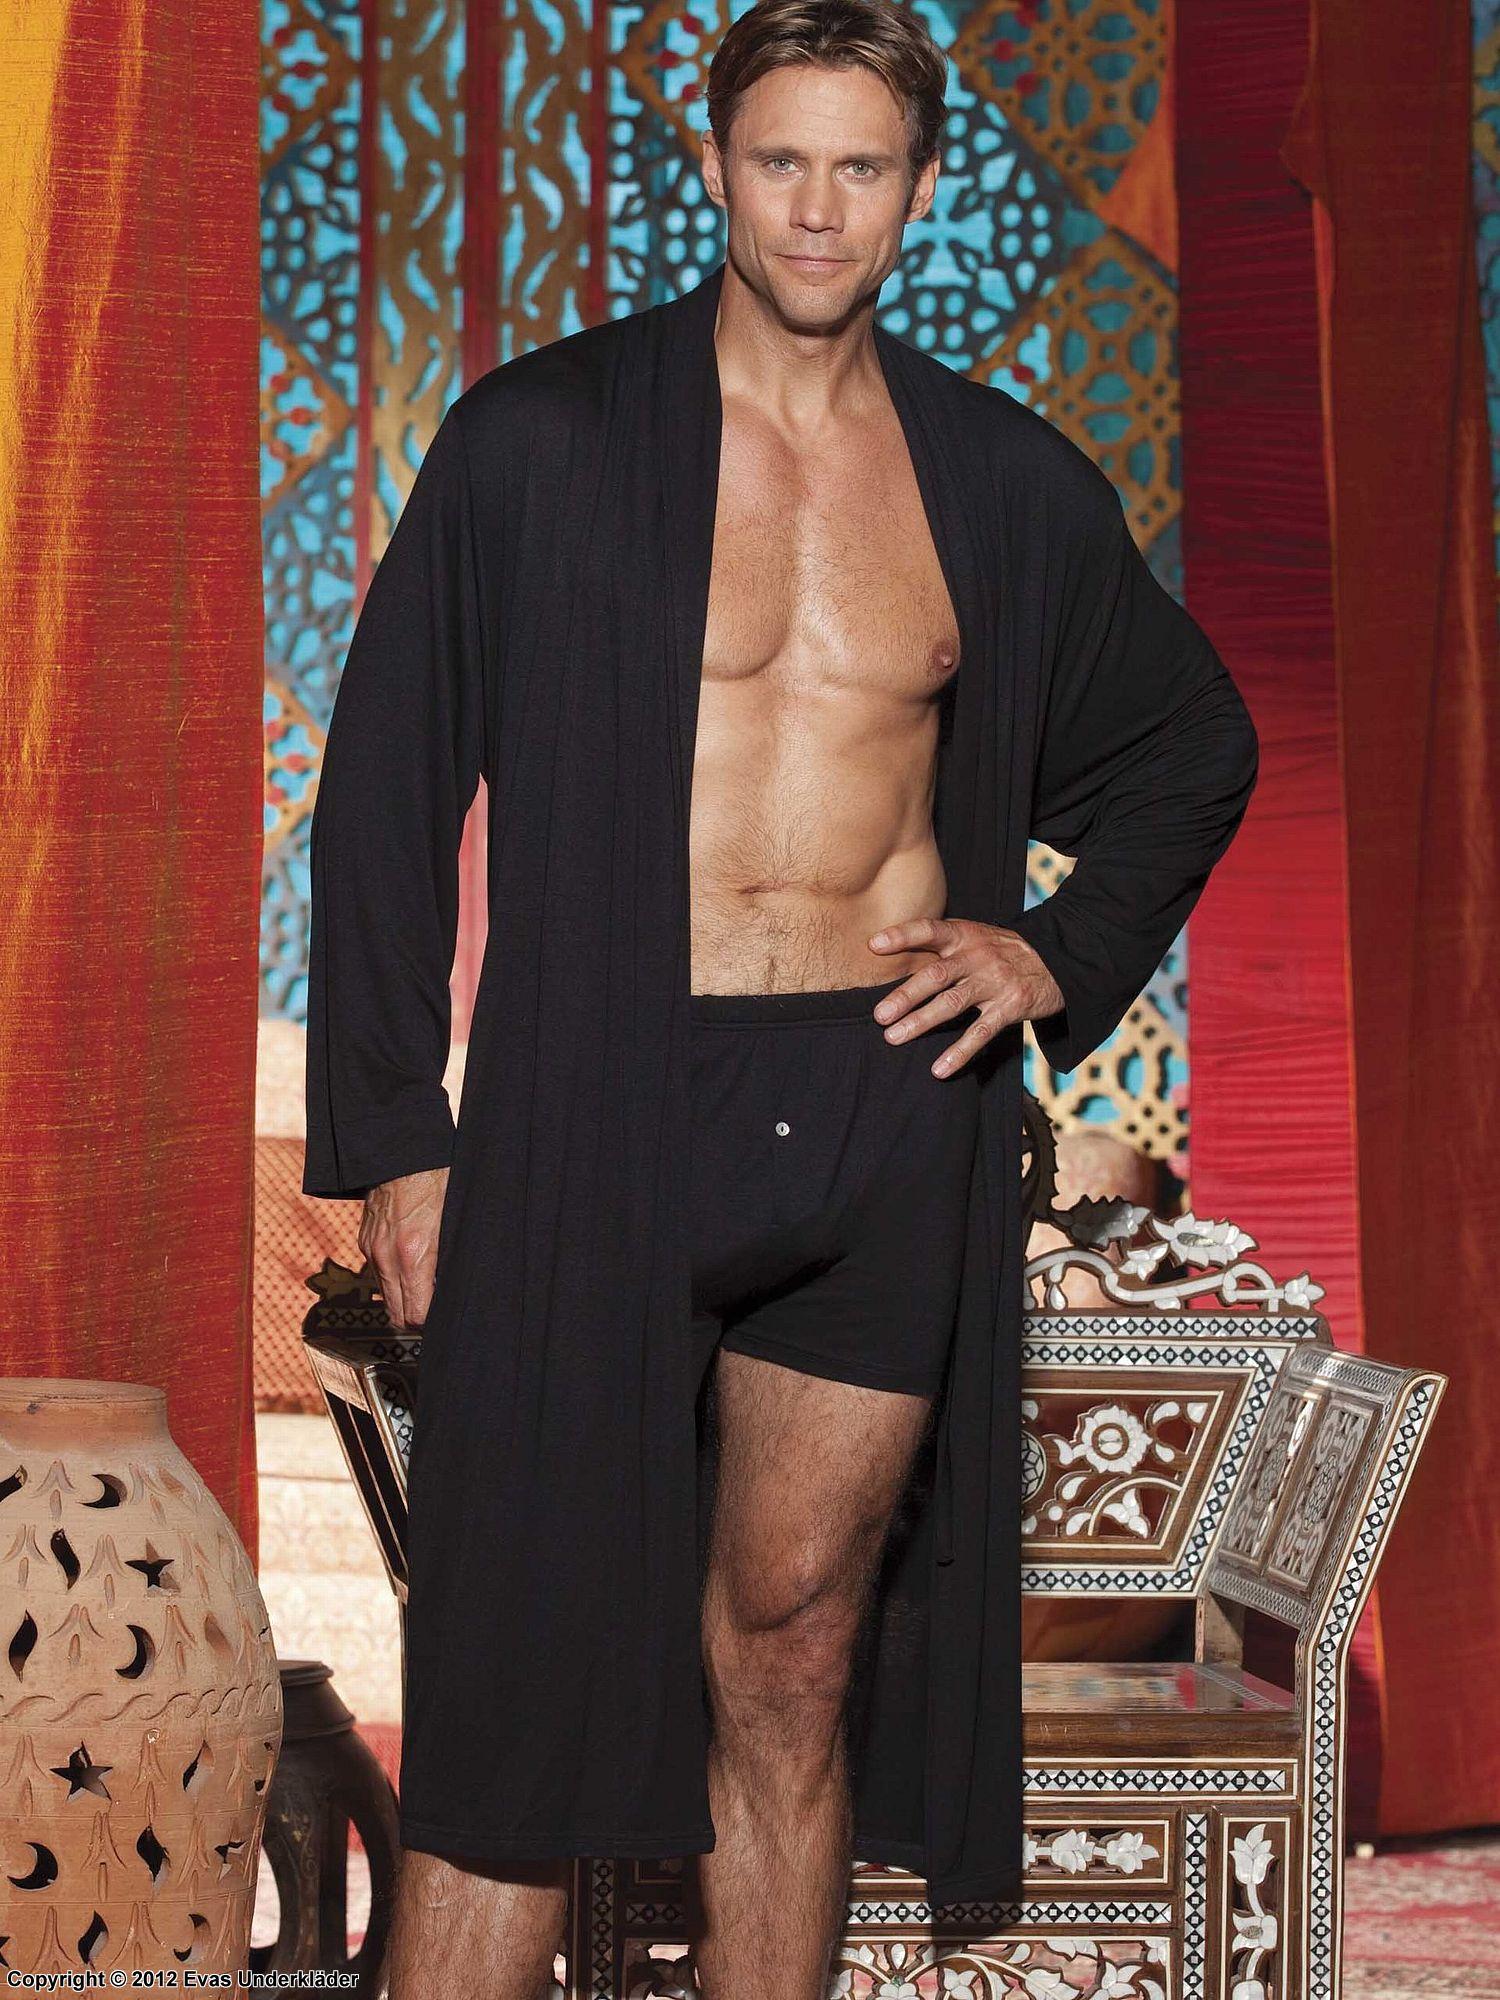 Sexiga Underkläder Plus Size Män I Trosor